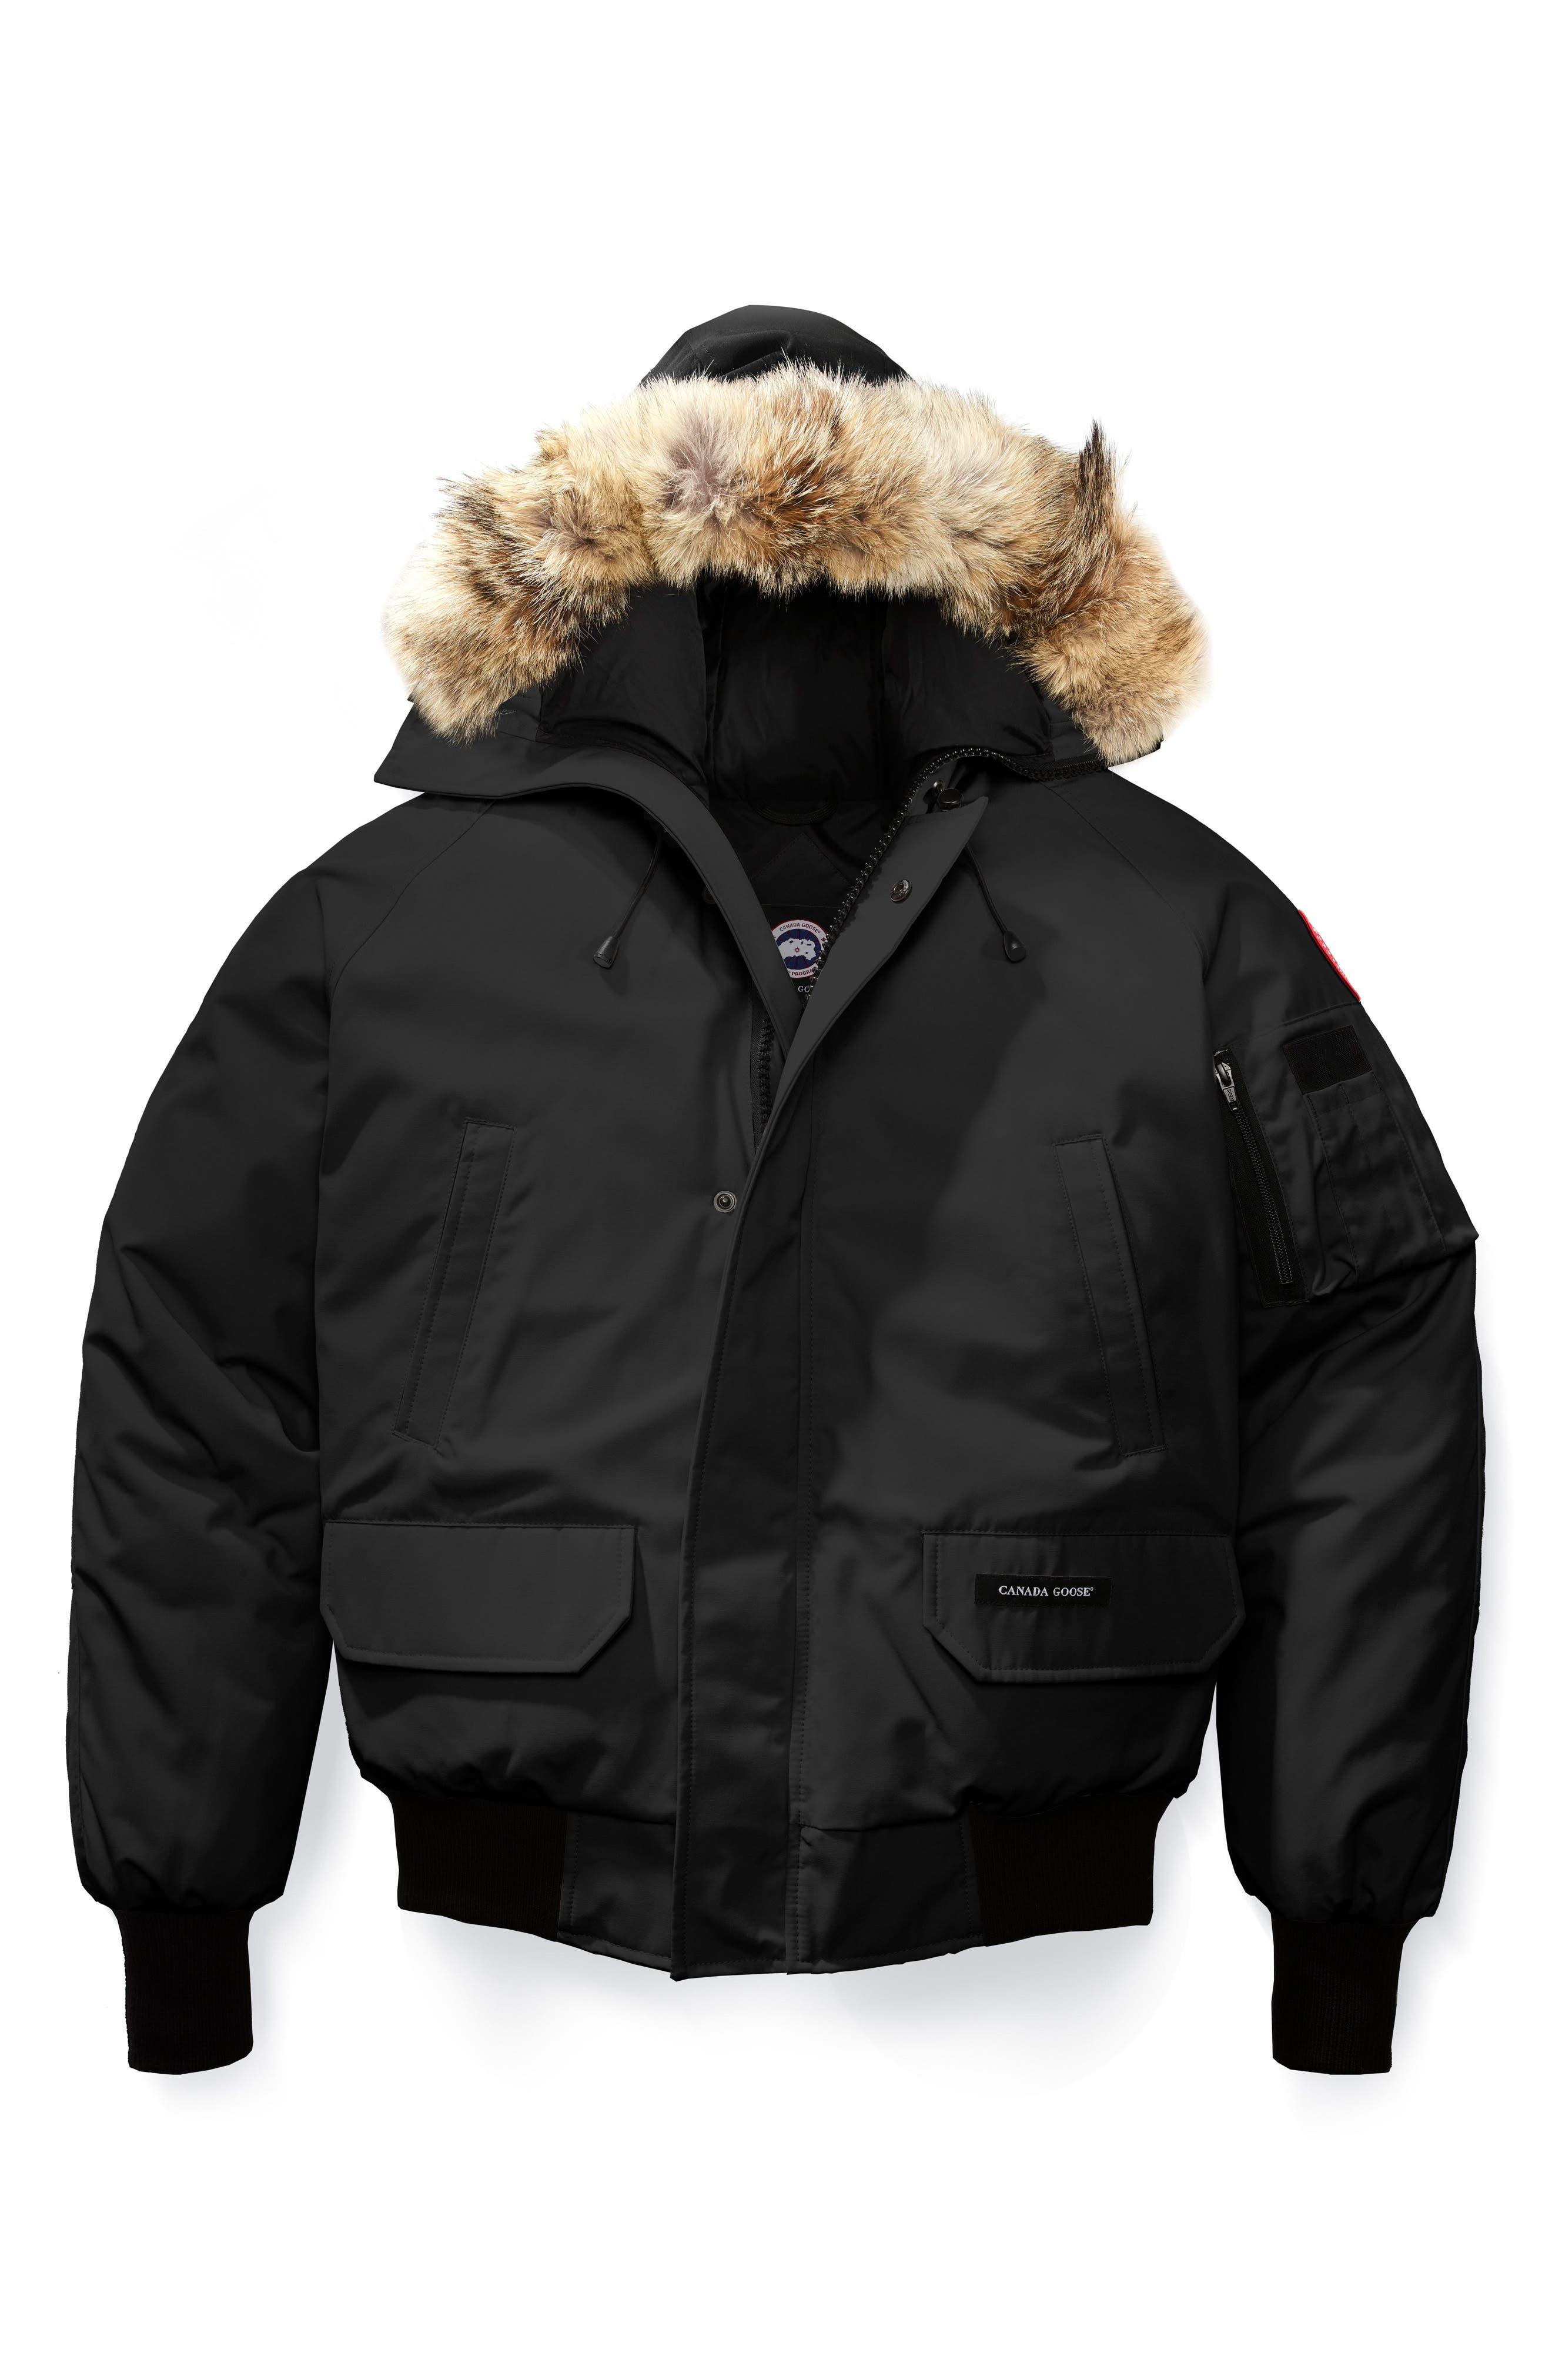 CANADA GOOSE, PBI Chilliwack Regular Fit Down Bomber Jacket with Genuine Coyote Trim, Alternate thumbnail 5, color, BLACK